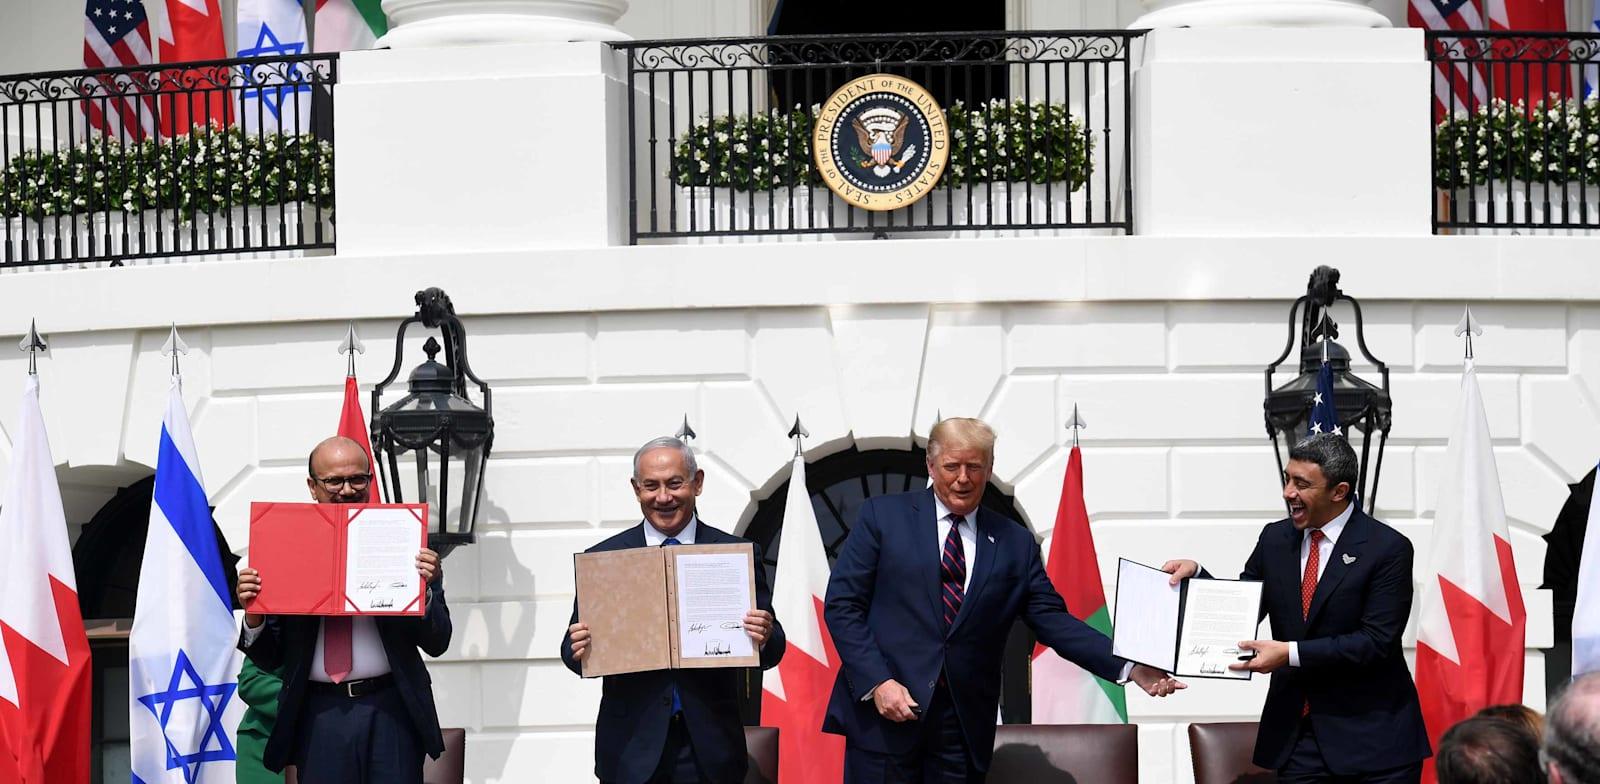 Abraham Accords signing ceremony Photo: Avi Ohayon GPO